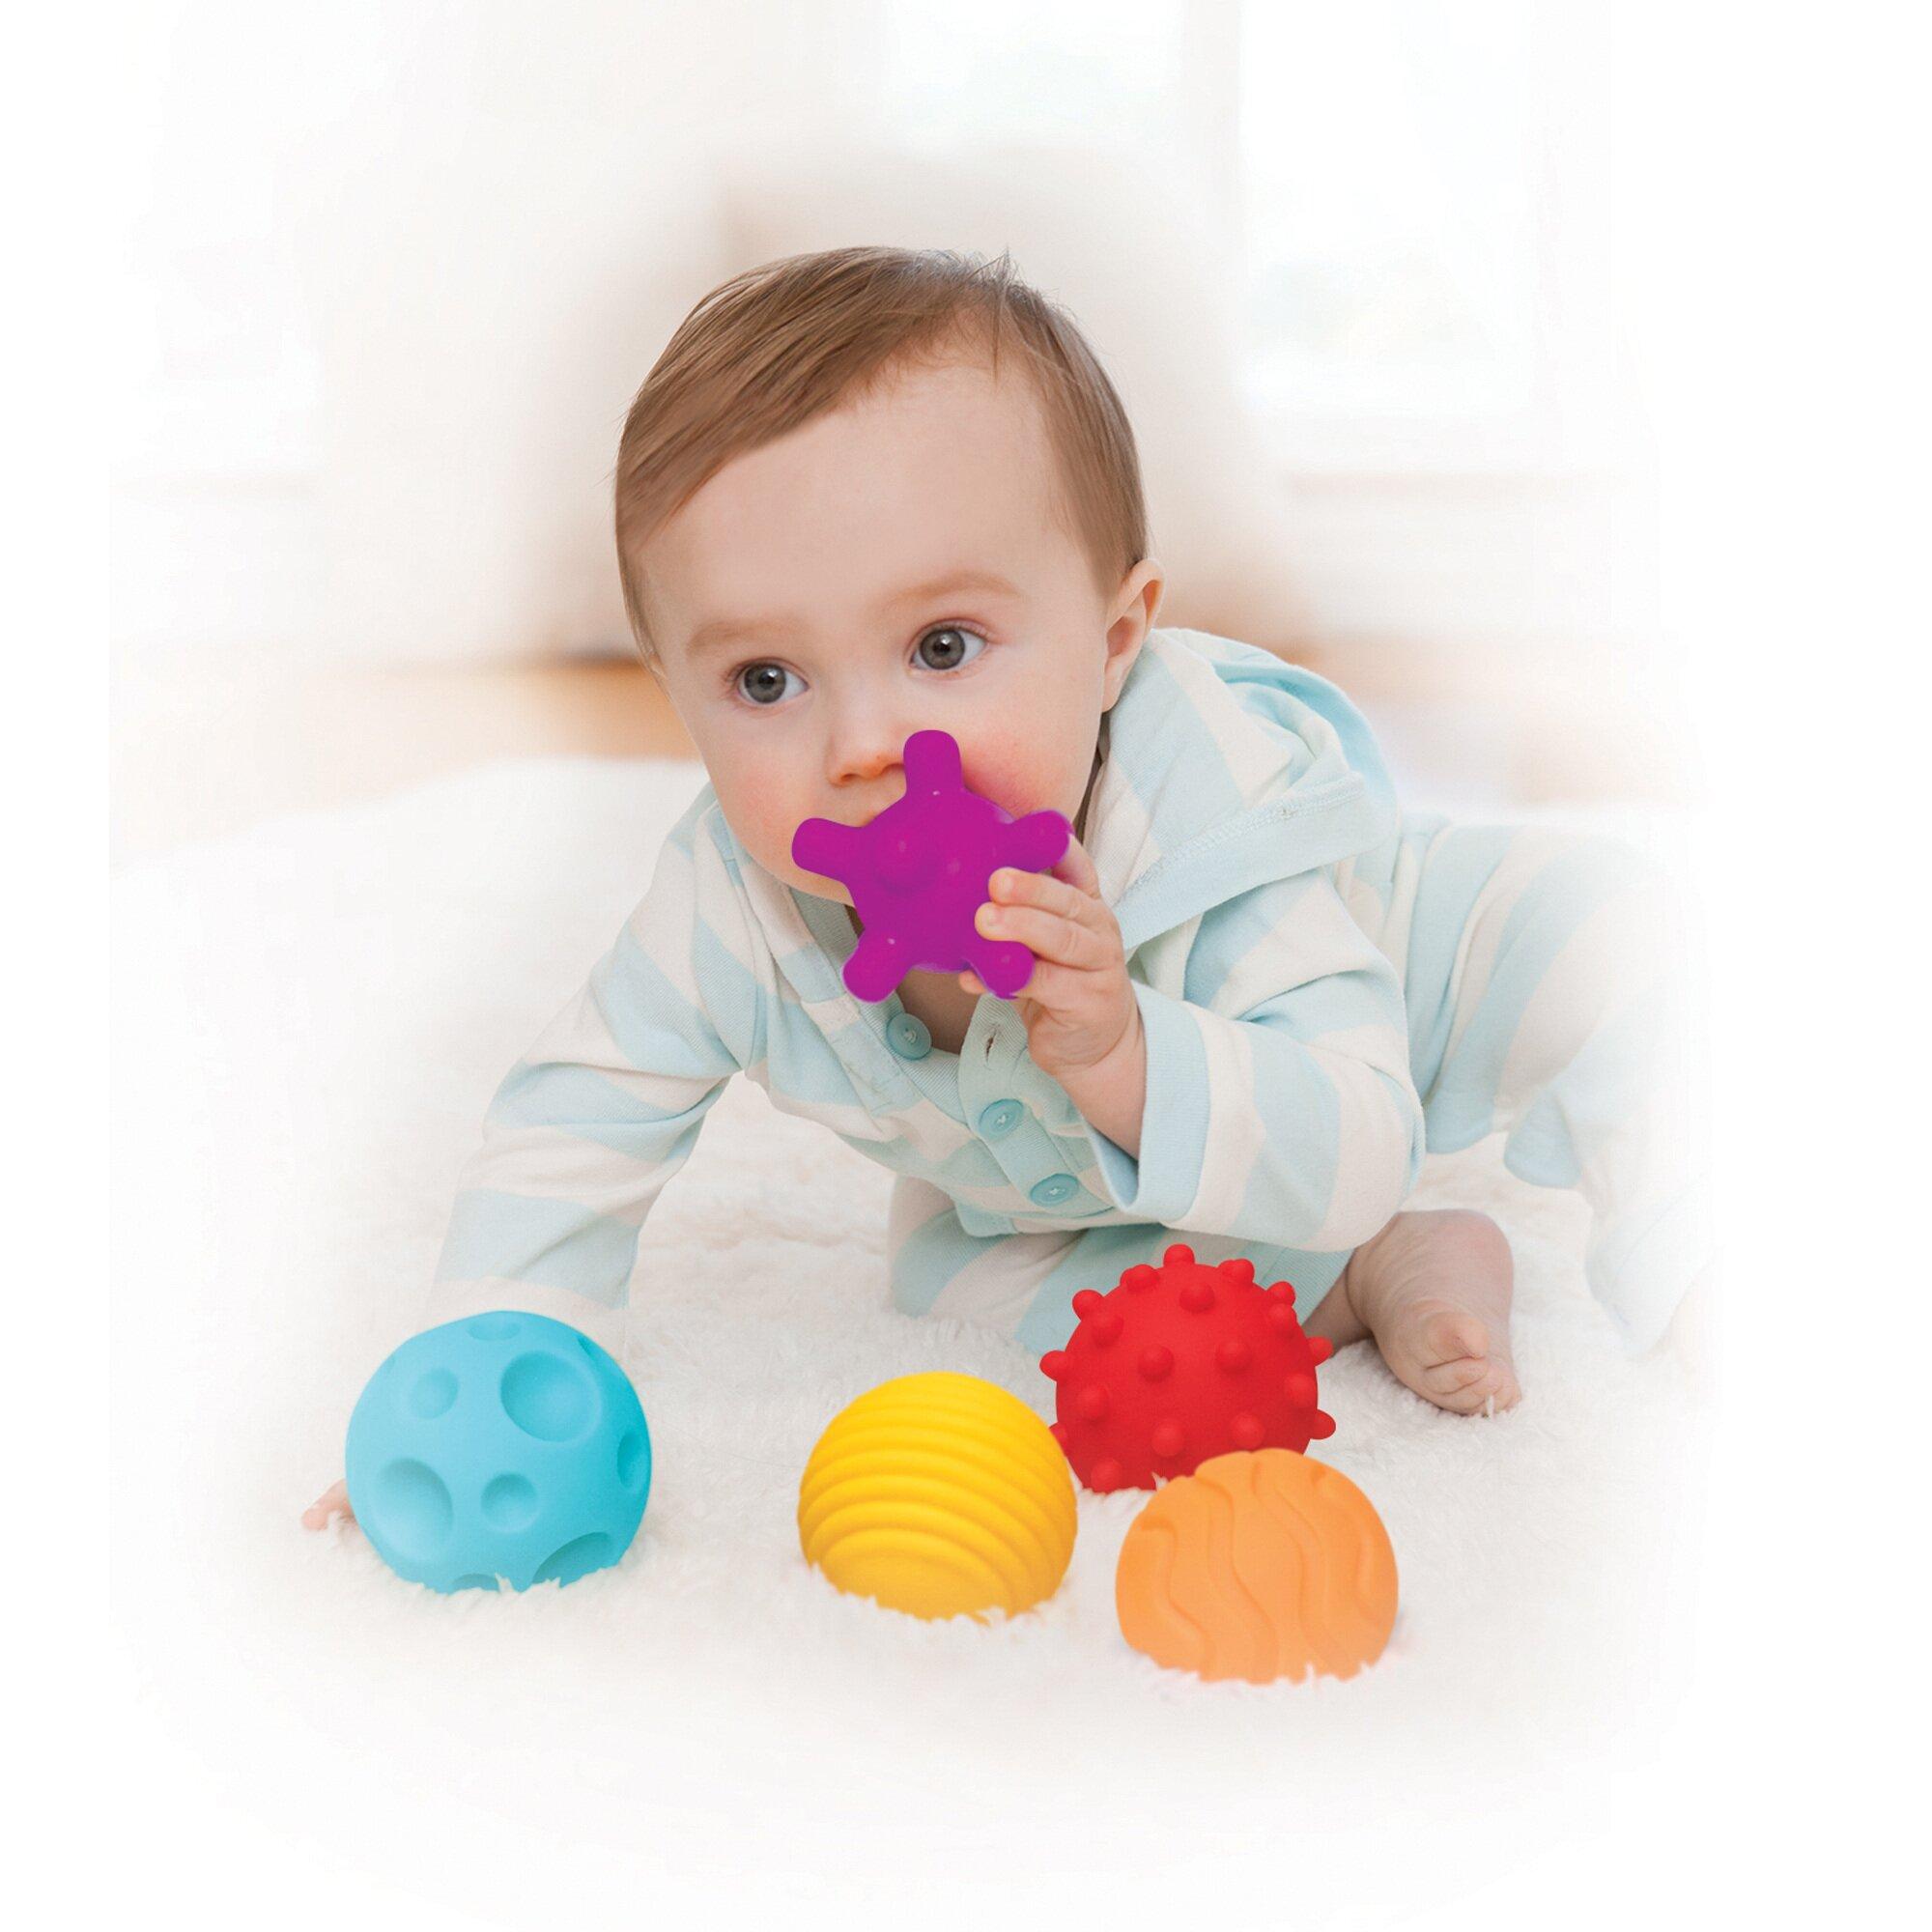 b-kids-balle-set-baby-sensorik